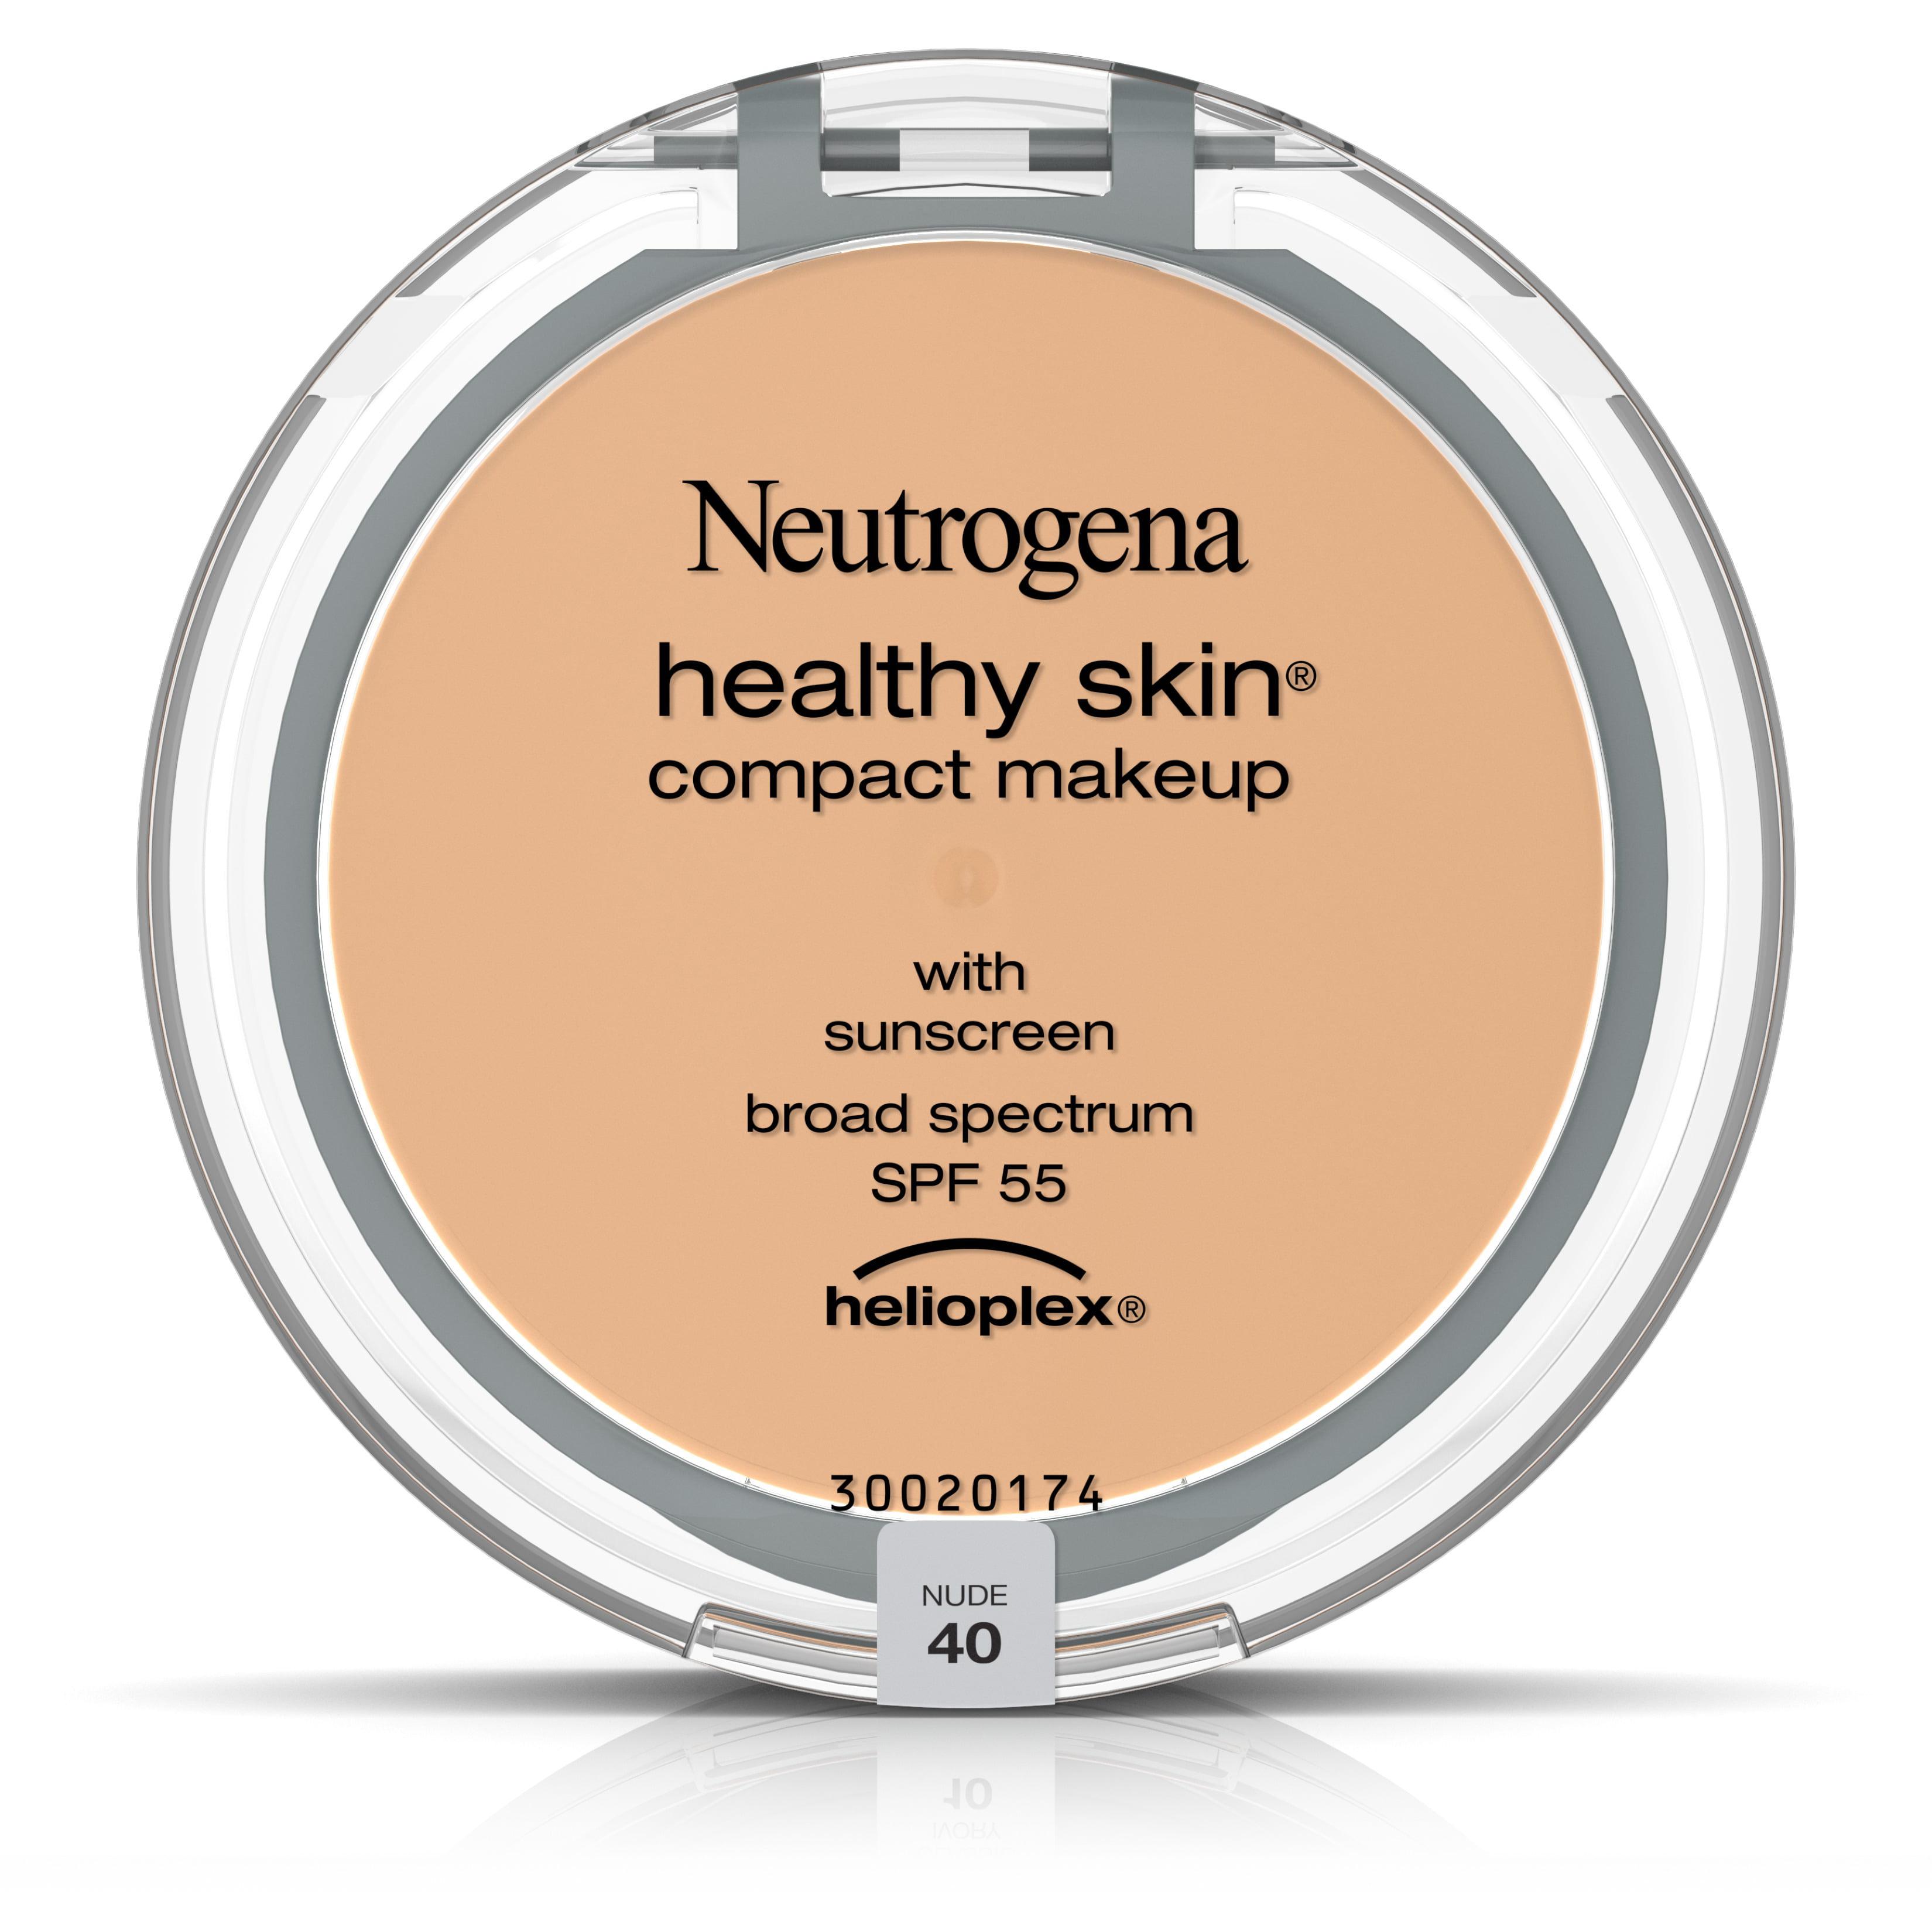 Neutrogena Healthy Skin Compact Makeup Broad Spectrum SPF 55, Nude 40, .35 Oz - Walmart.com